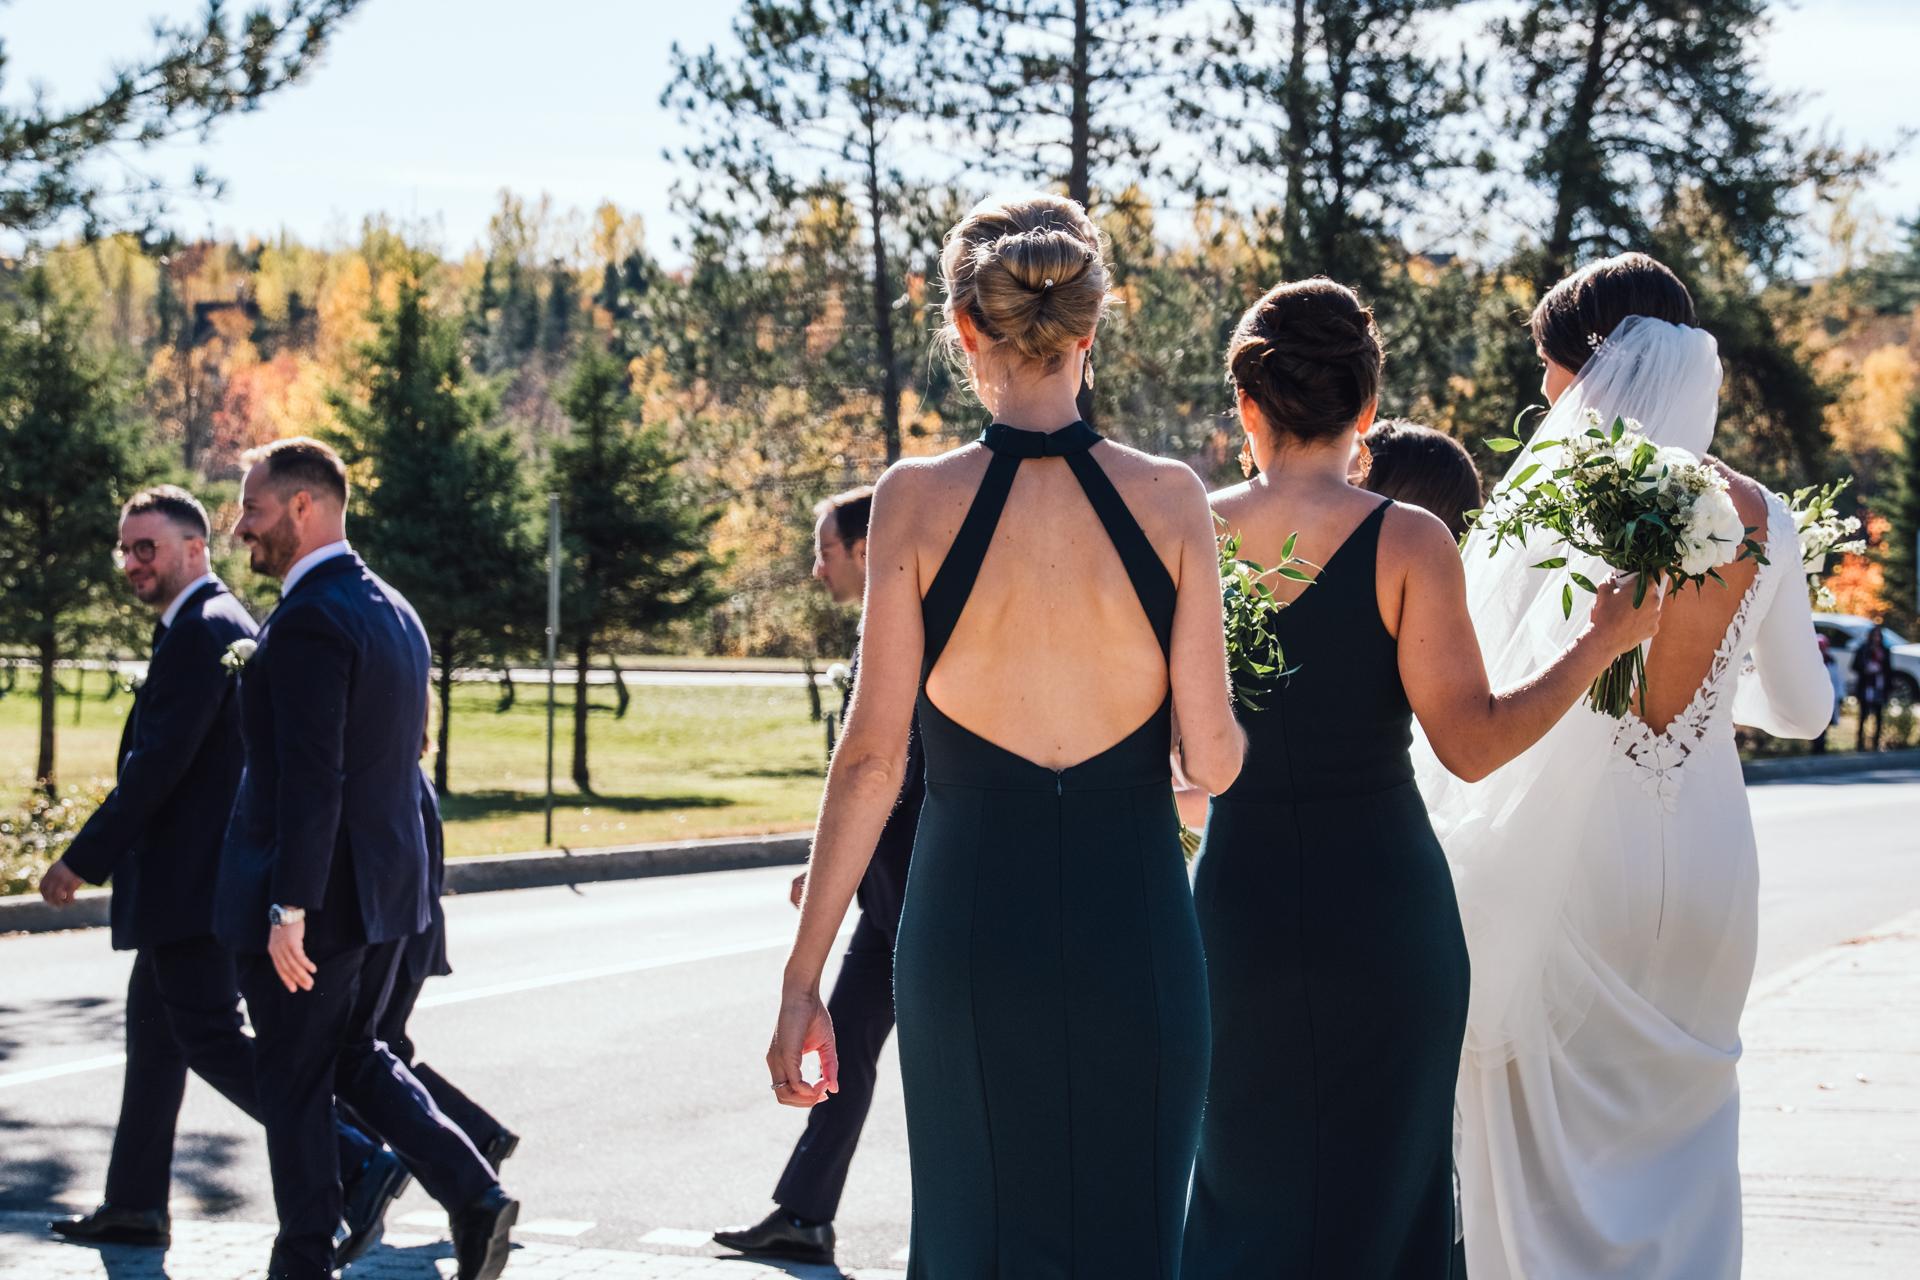 Photographe-mariage-mont-tremblant-25